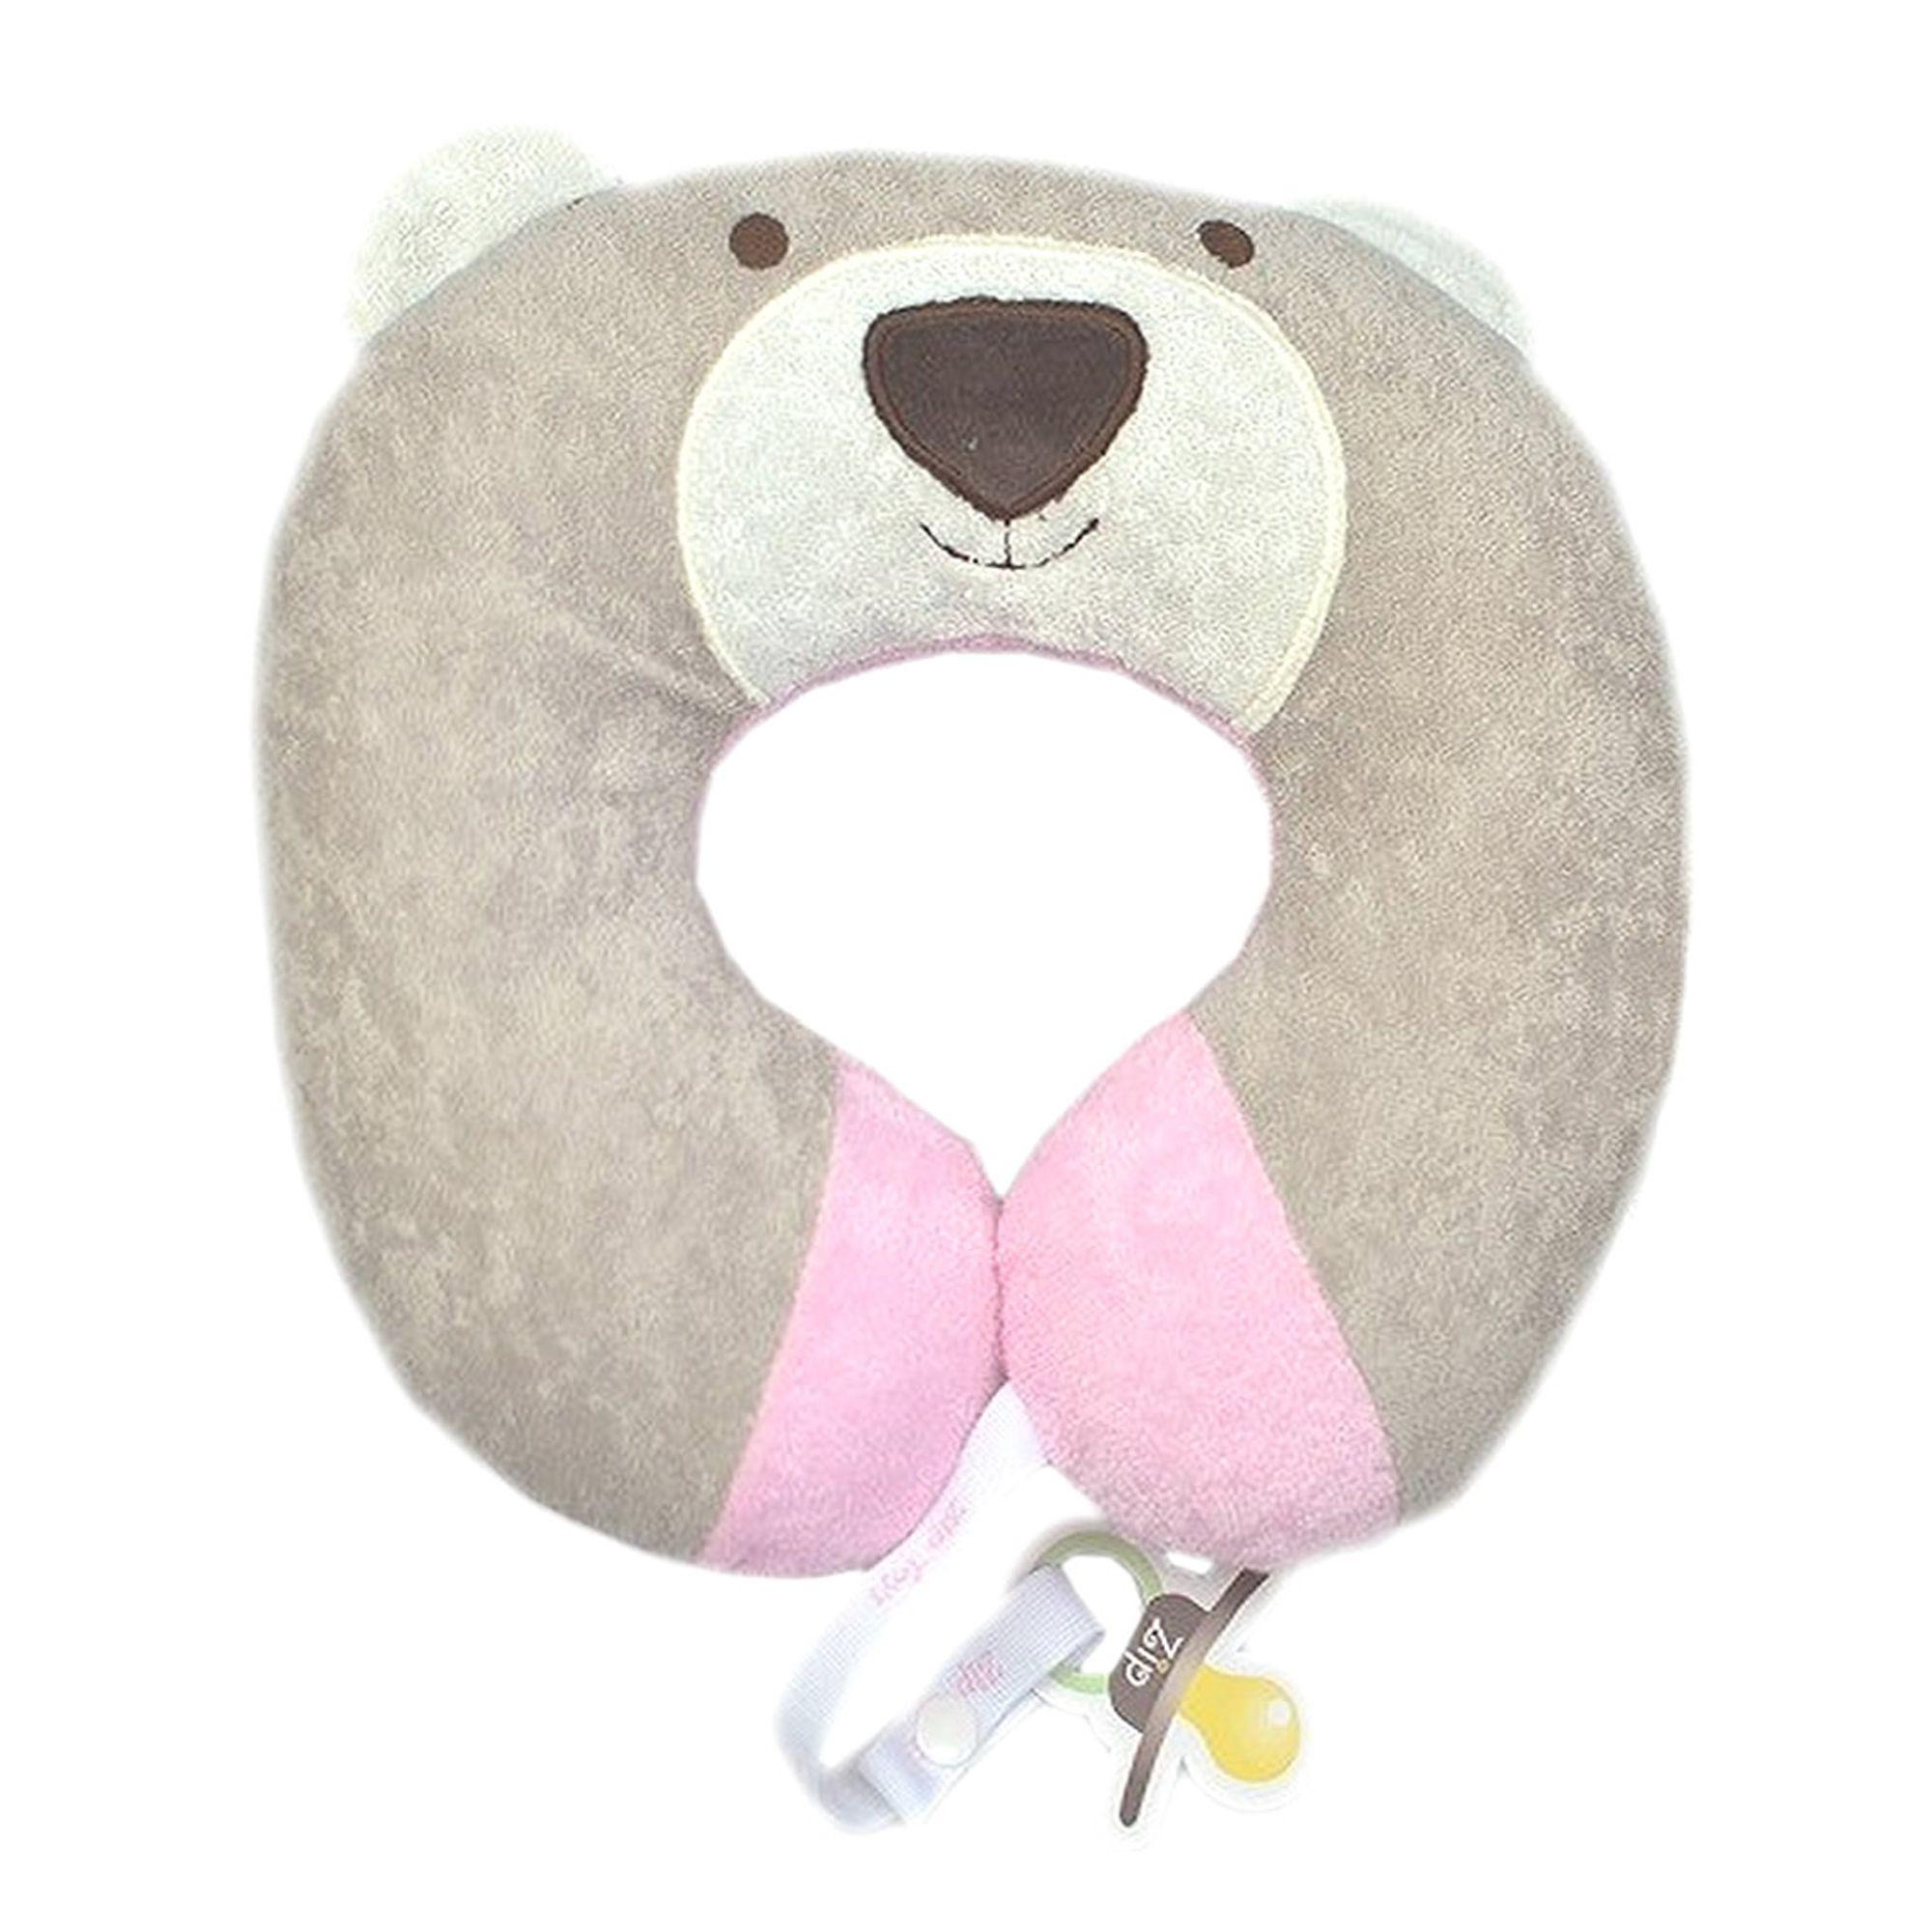 protetor-pescoco-baby-urso-nino-rosa-zip-toys-prendedor-chupeta